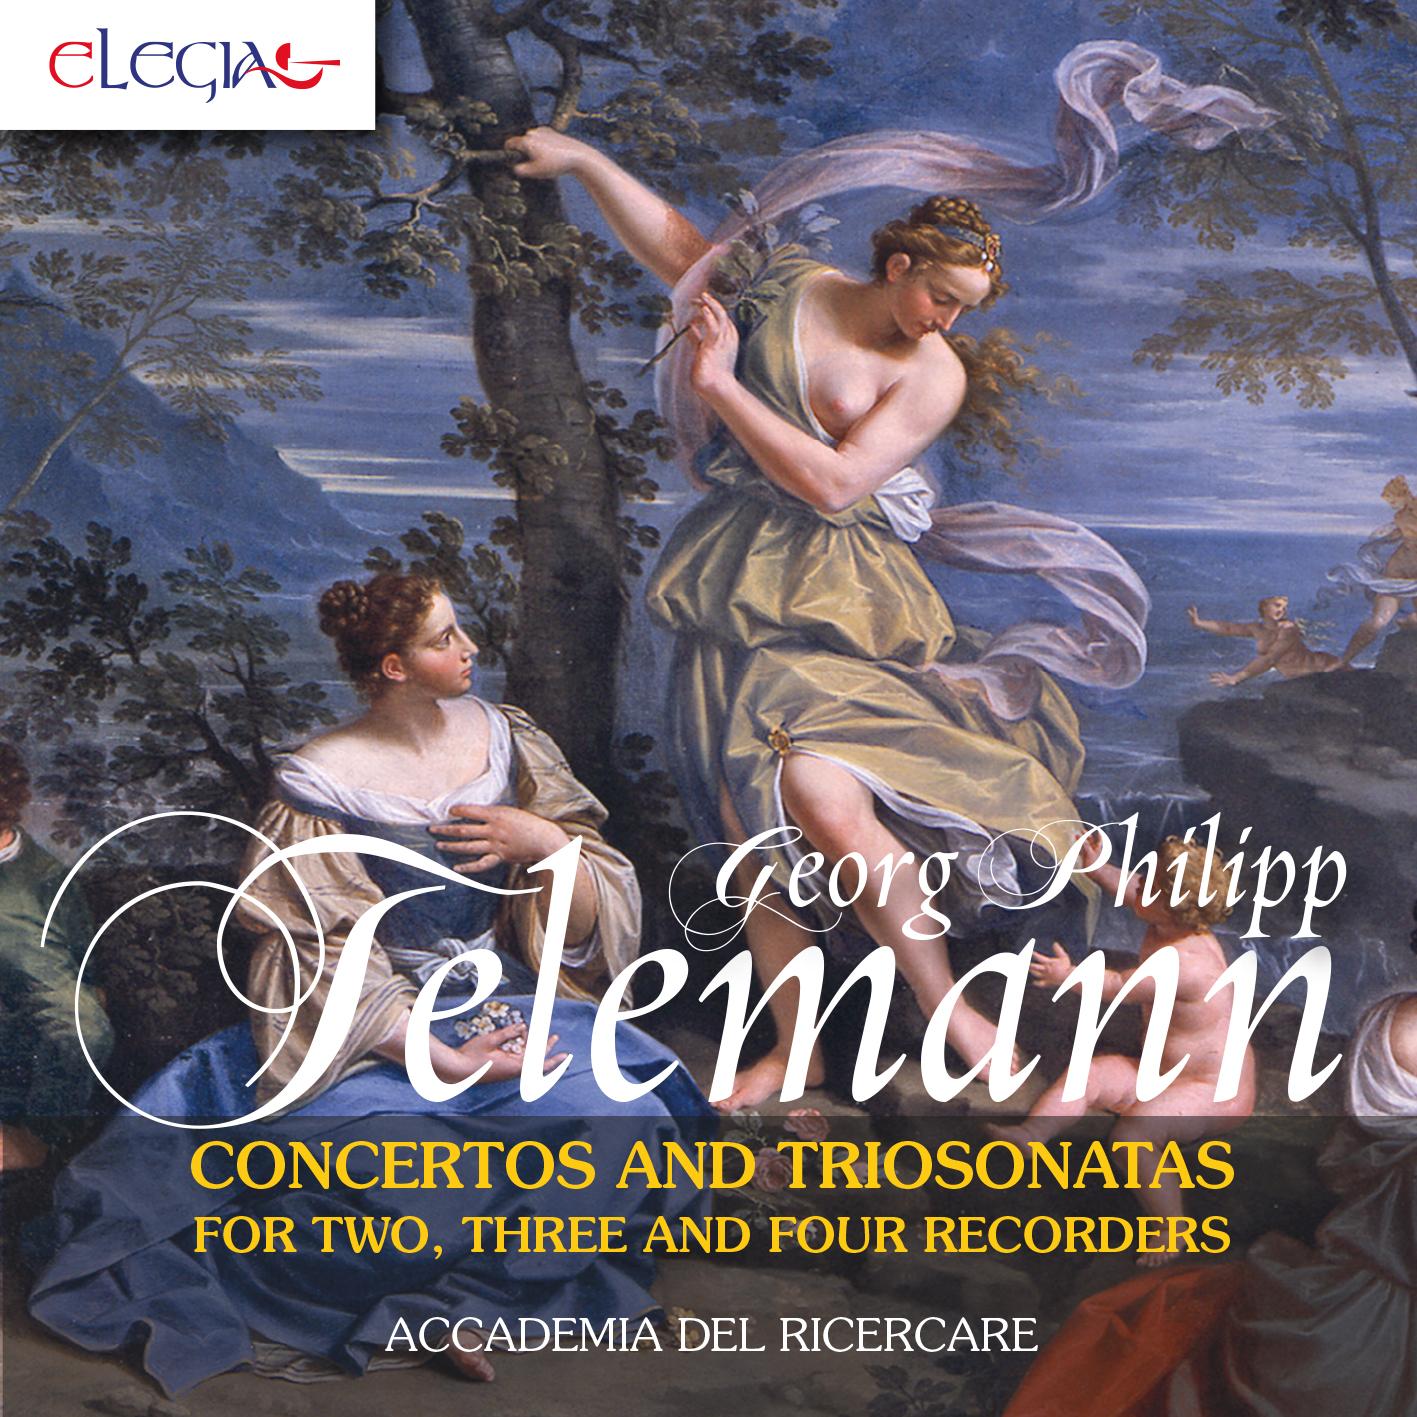 Concertos and triosonatas